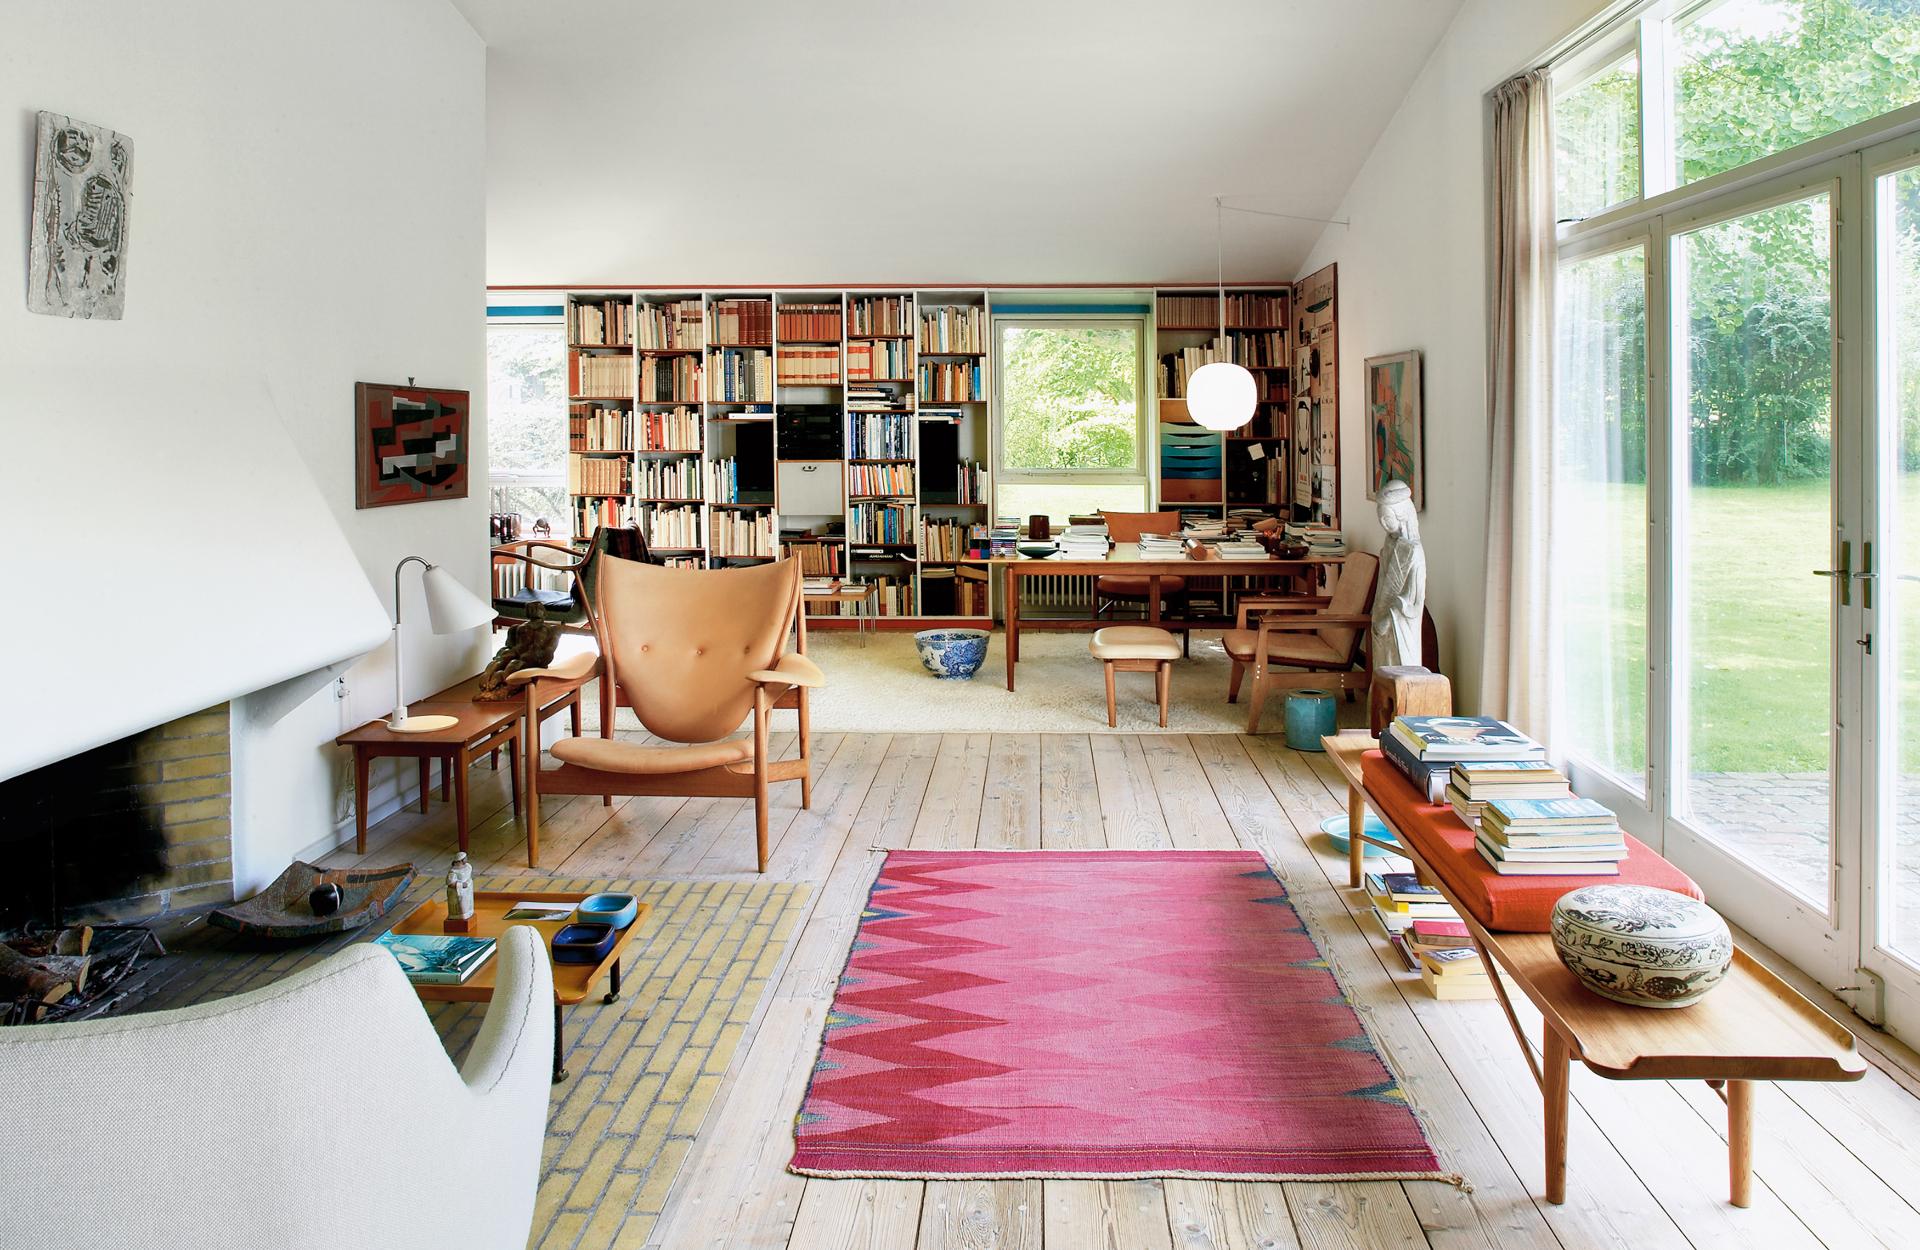 Finn Juhl's house outside of Copenhagen